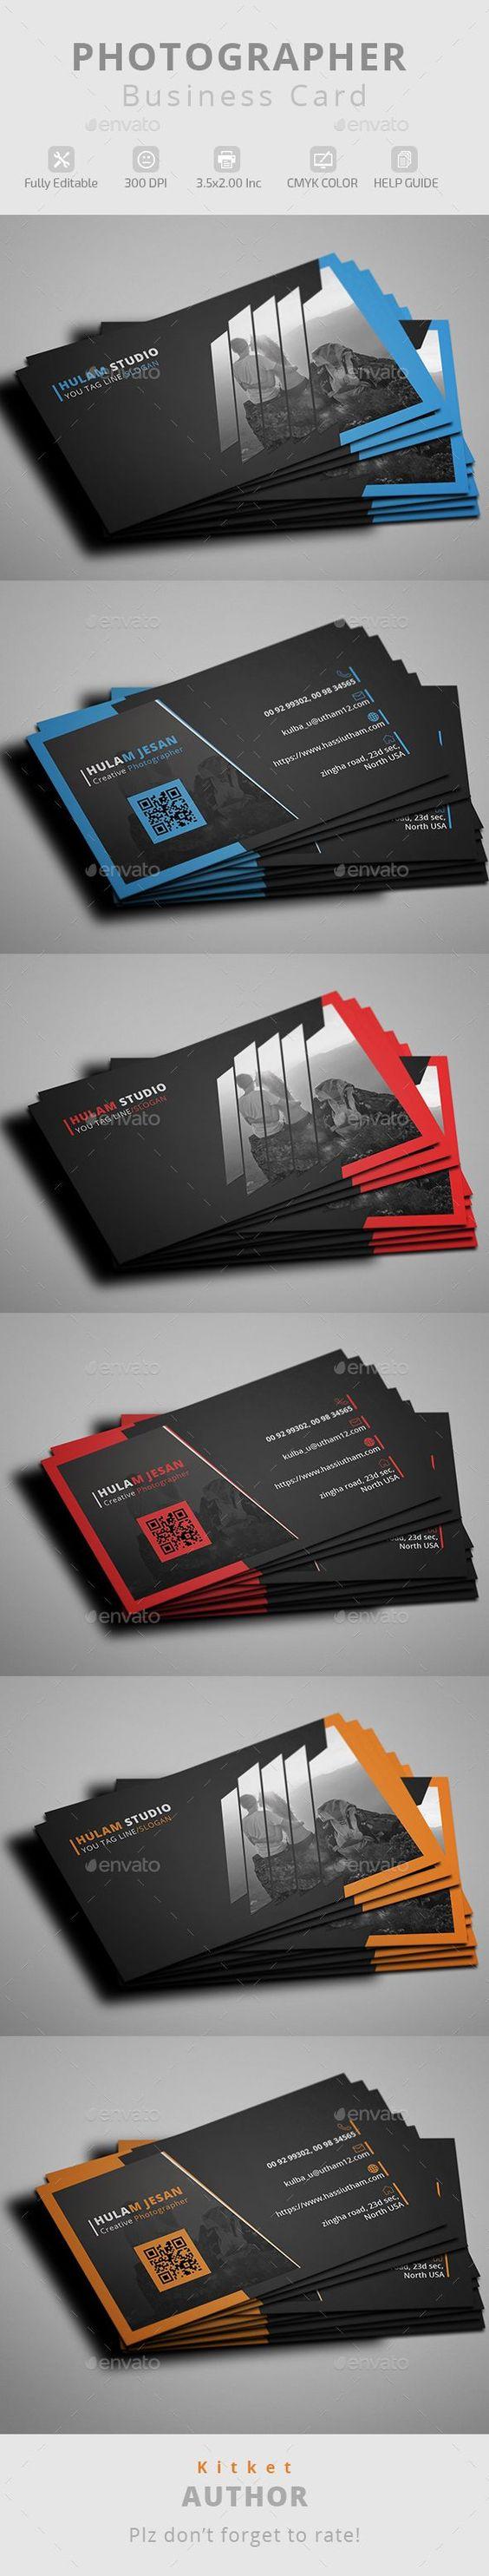 Photographer Business Card Template PSD #visitcard #design Download: graphicriver.net/... Free business card design http://www.plasticcardonline.com/